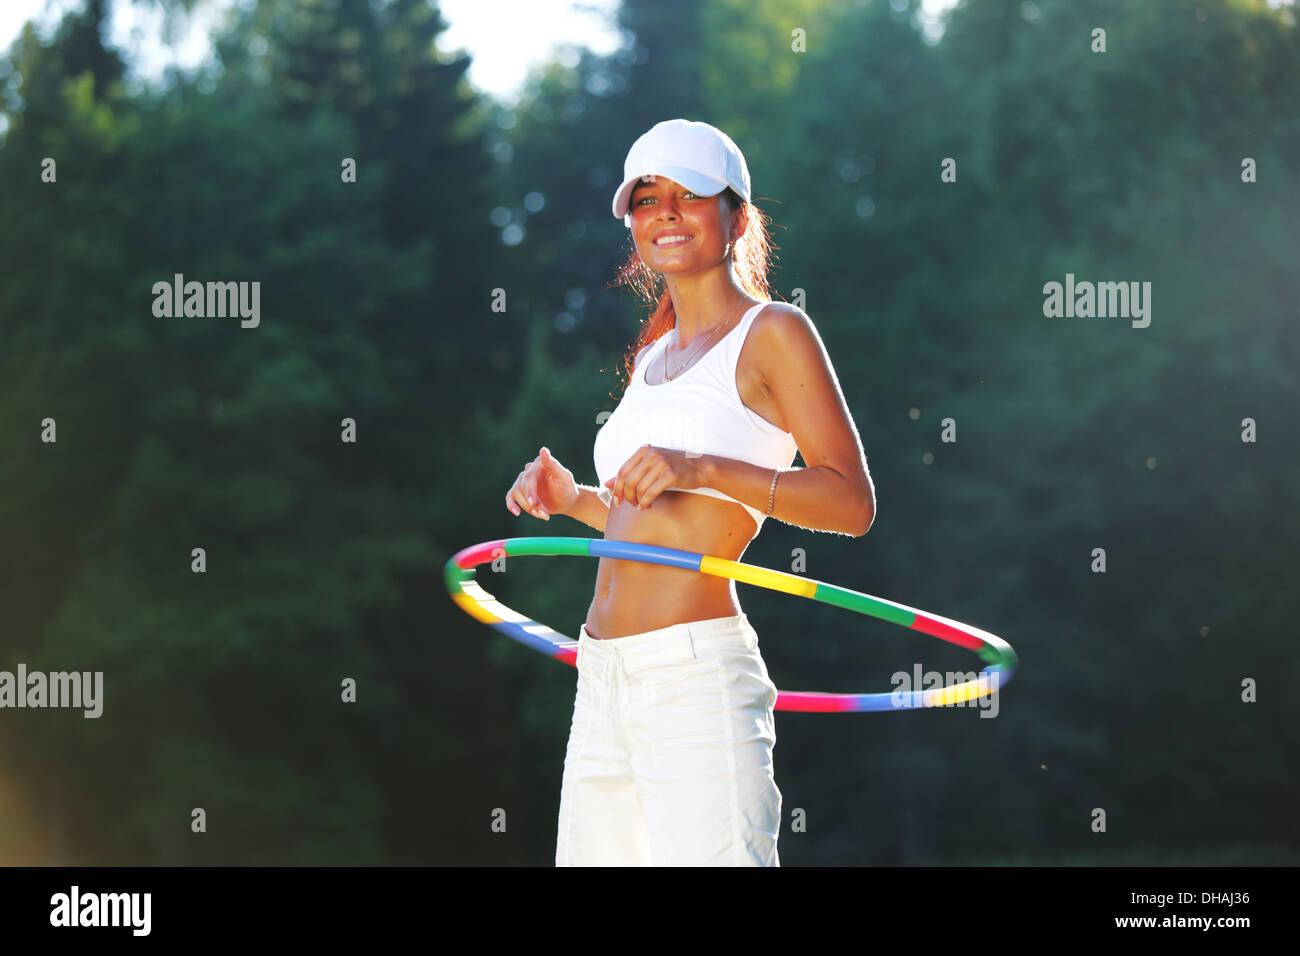 woman rotates hula hoop on nature background - Stock Image